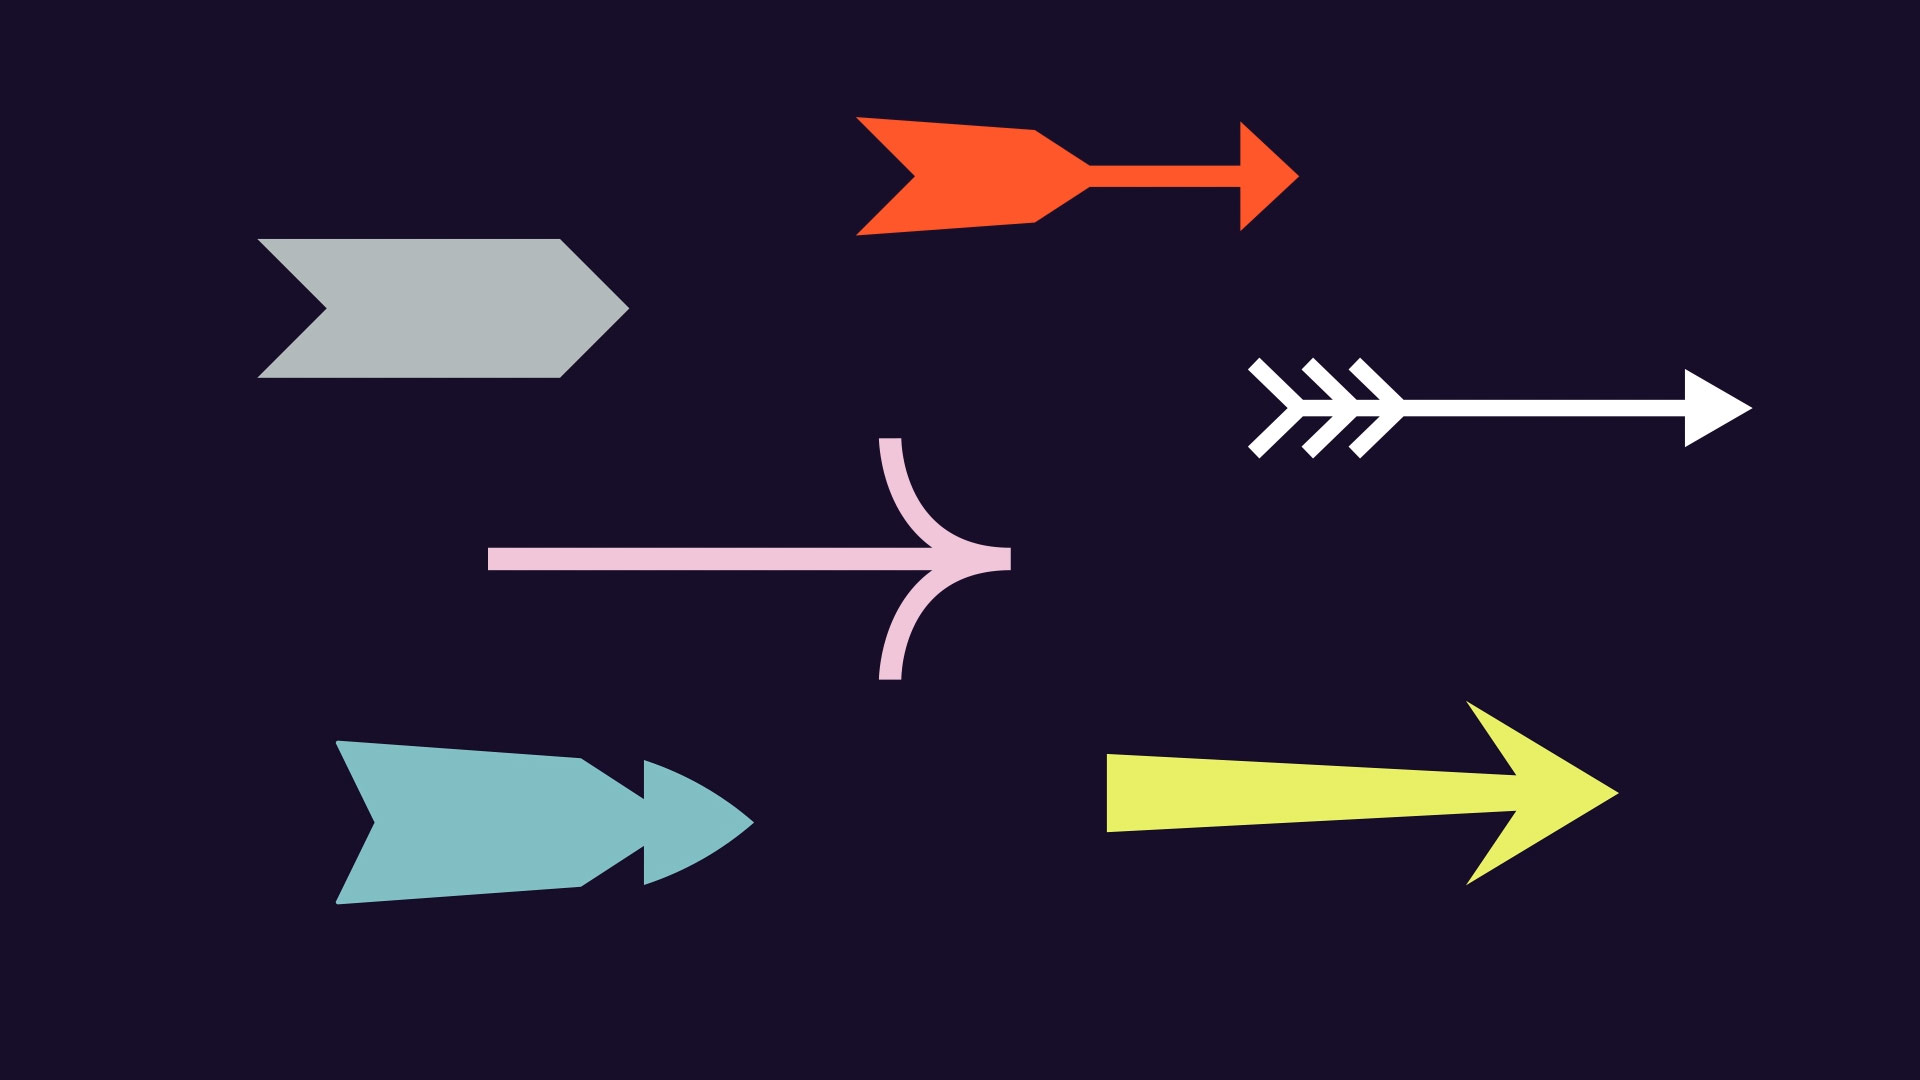 Making Moves Arrows - OK Social